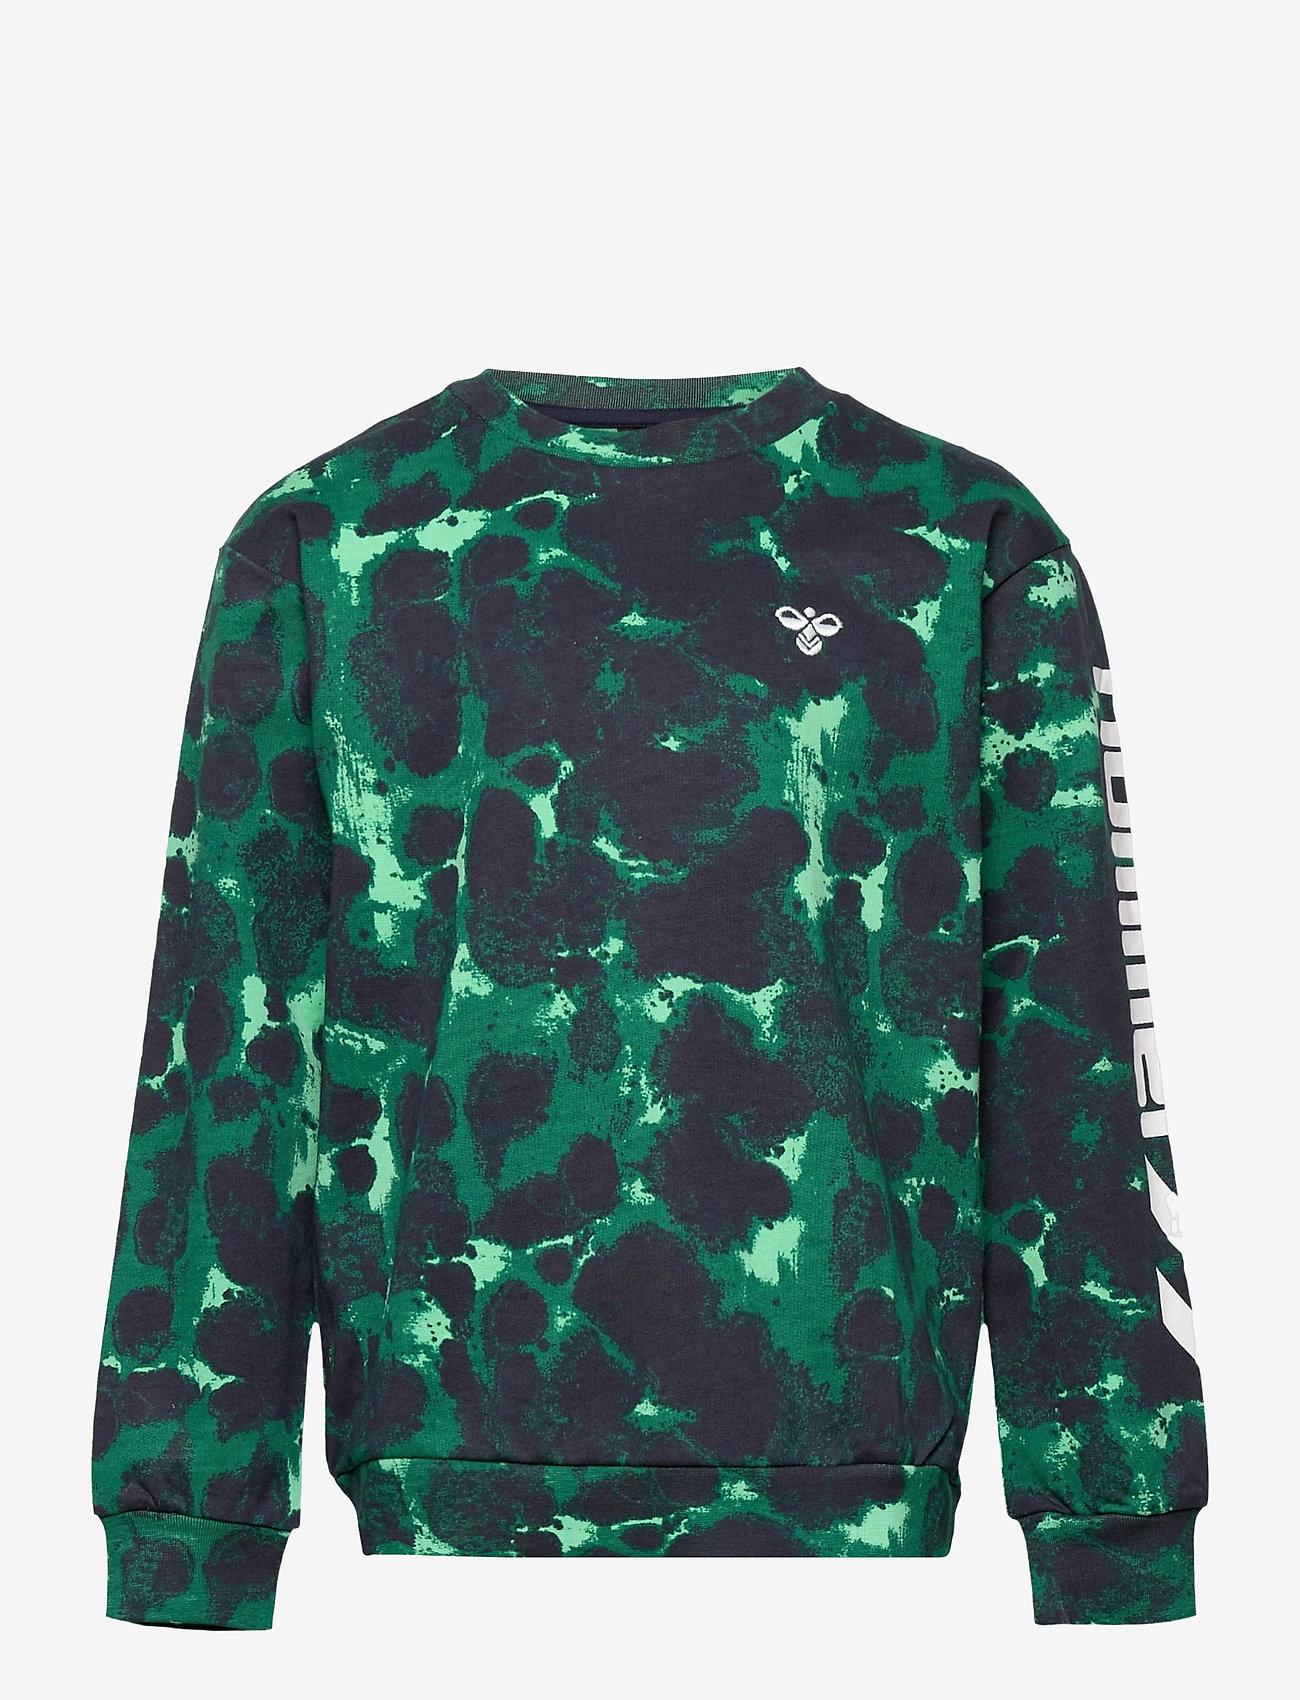 Hummel - hmlDRAKE SWEATSHIRT - sweatshirts - jade cream - 0